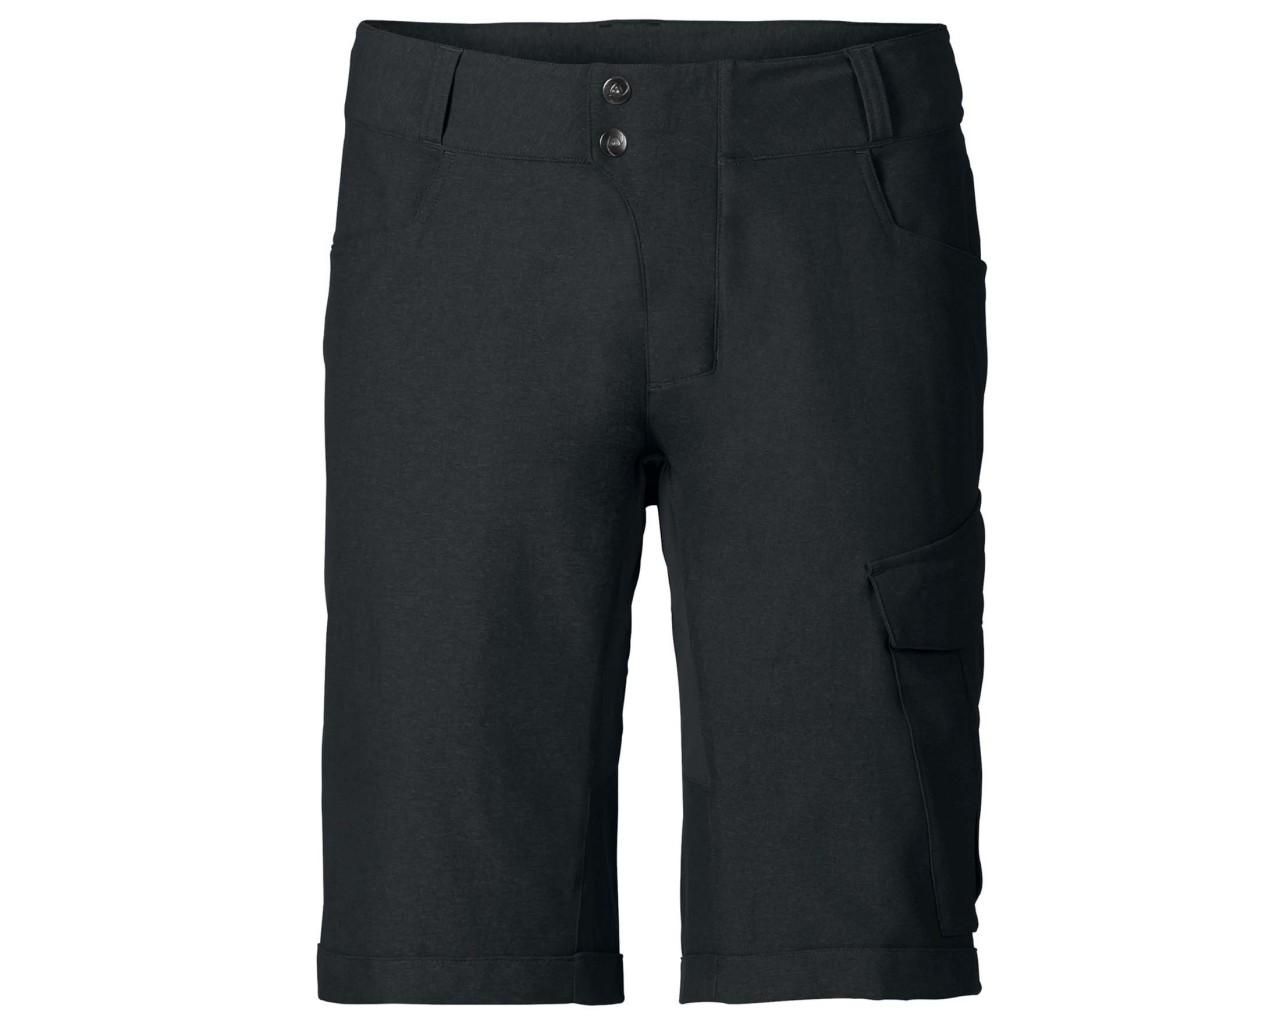 Vaude Herren Tremalzo Shorts II | black